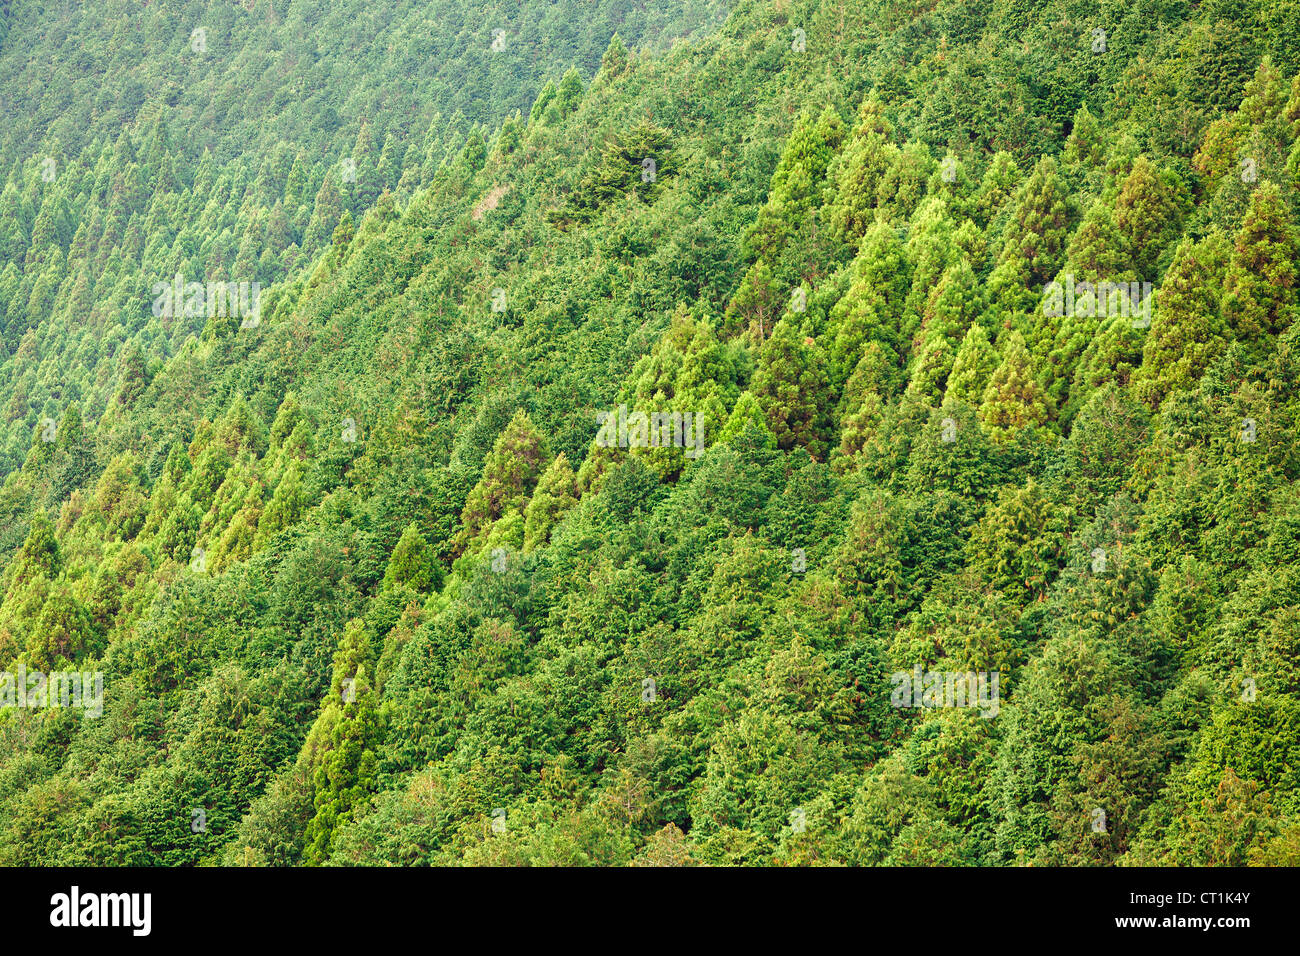 cryptomeria conifer forest background, Japan - Stock Image